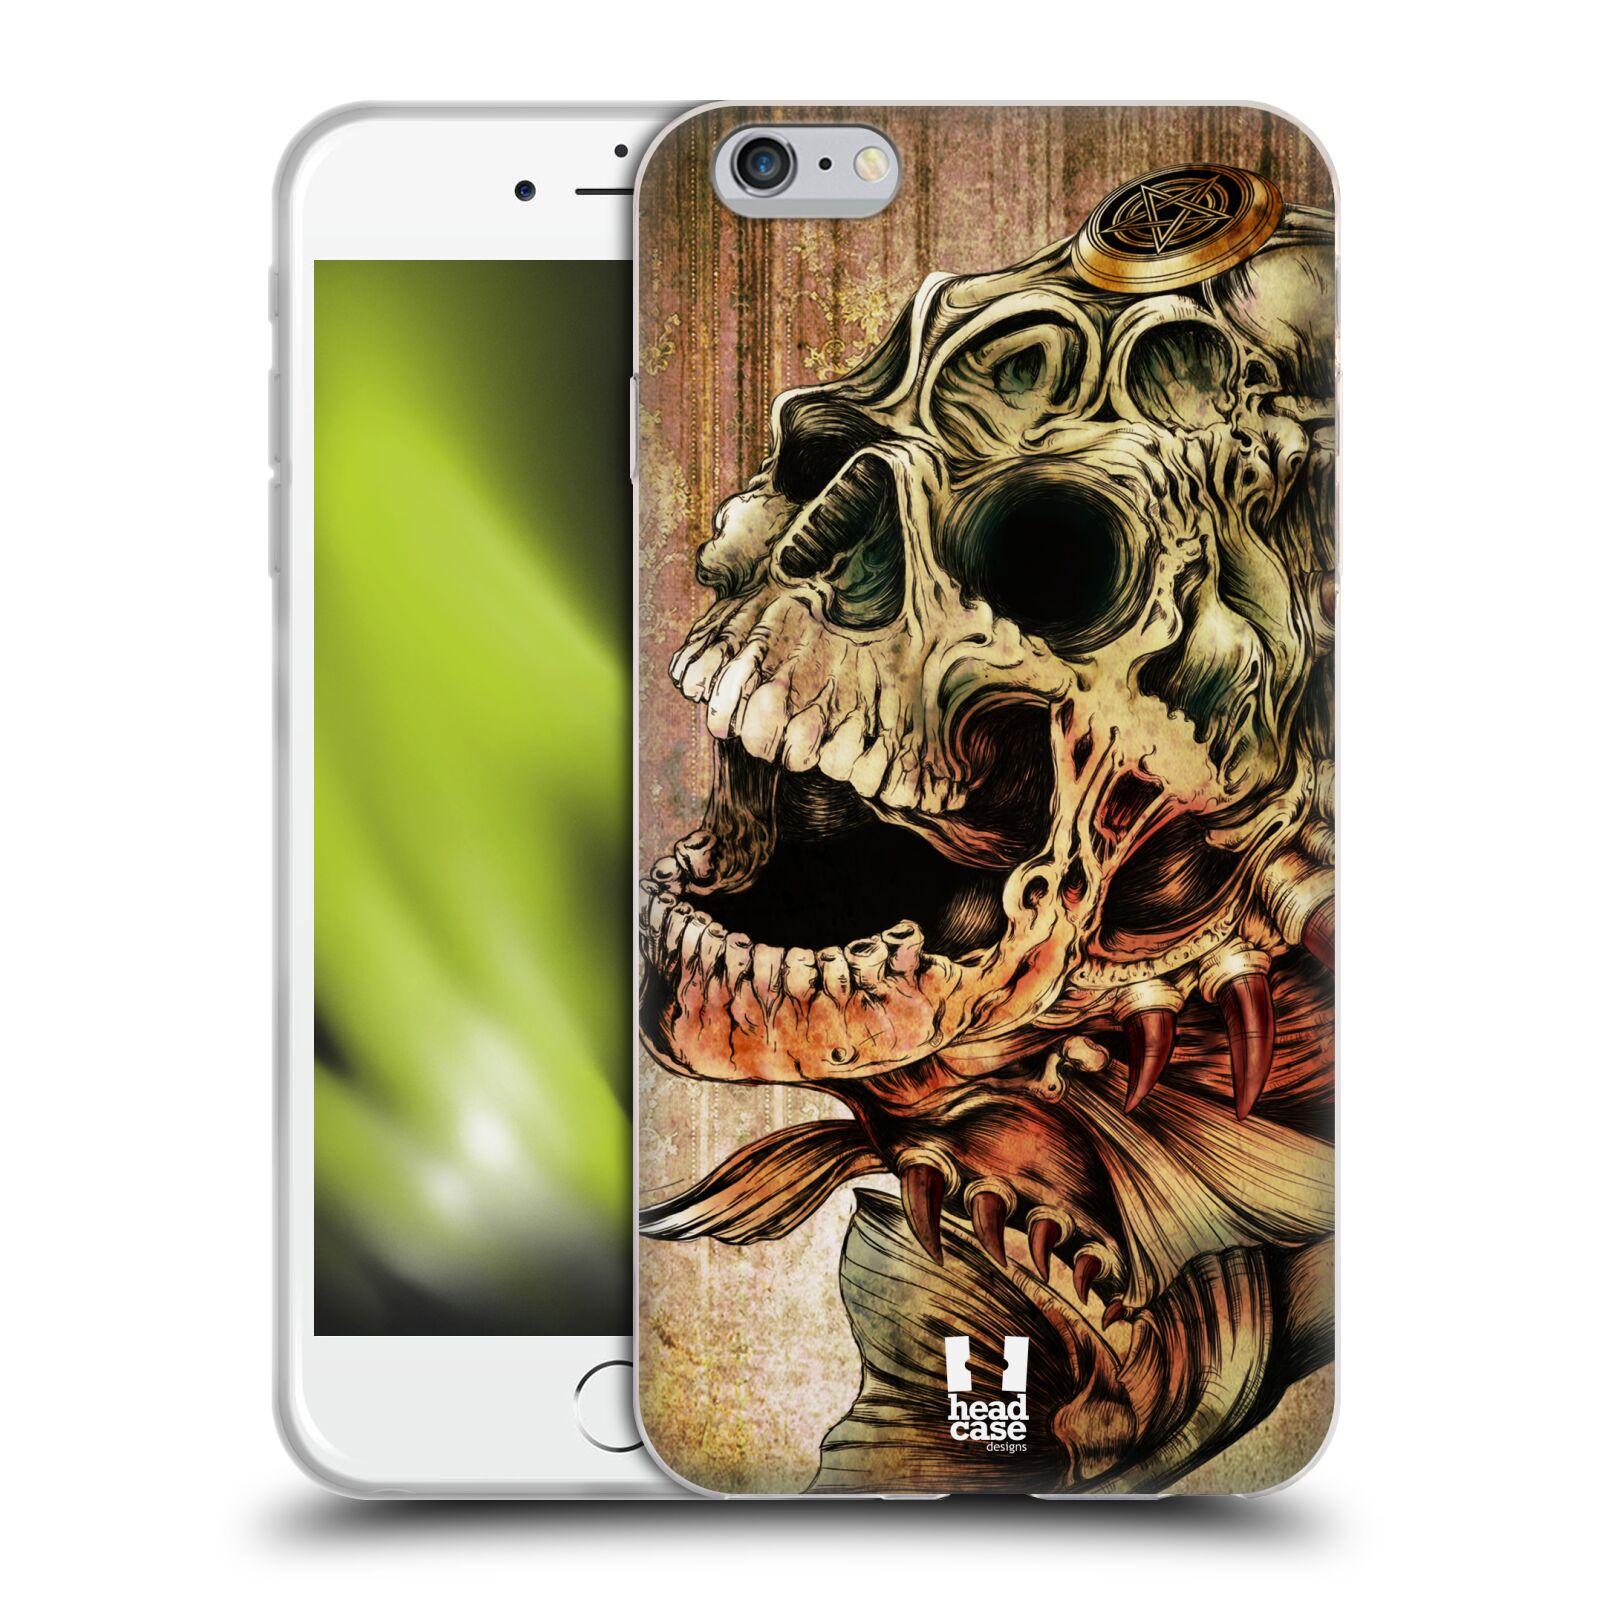 HEAD CASE silikonový obal na mobil Apple Iphone 6 PLUS/ 6S PLUS vzor Kreslené lebky METAL Piraňa